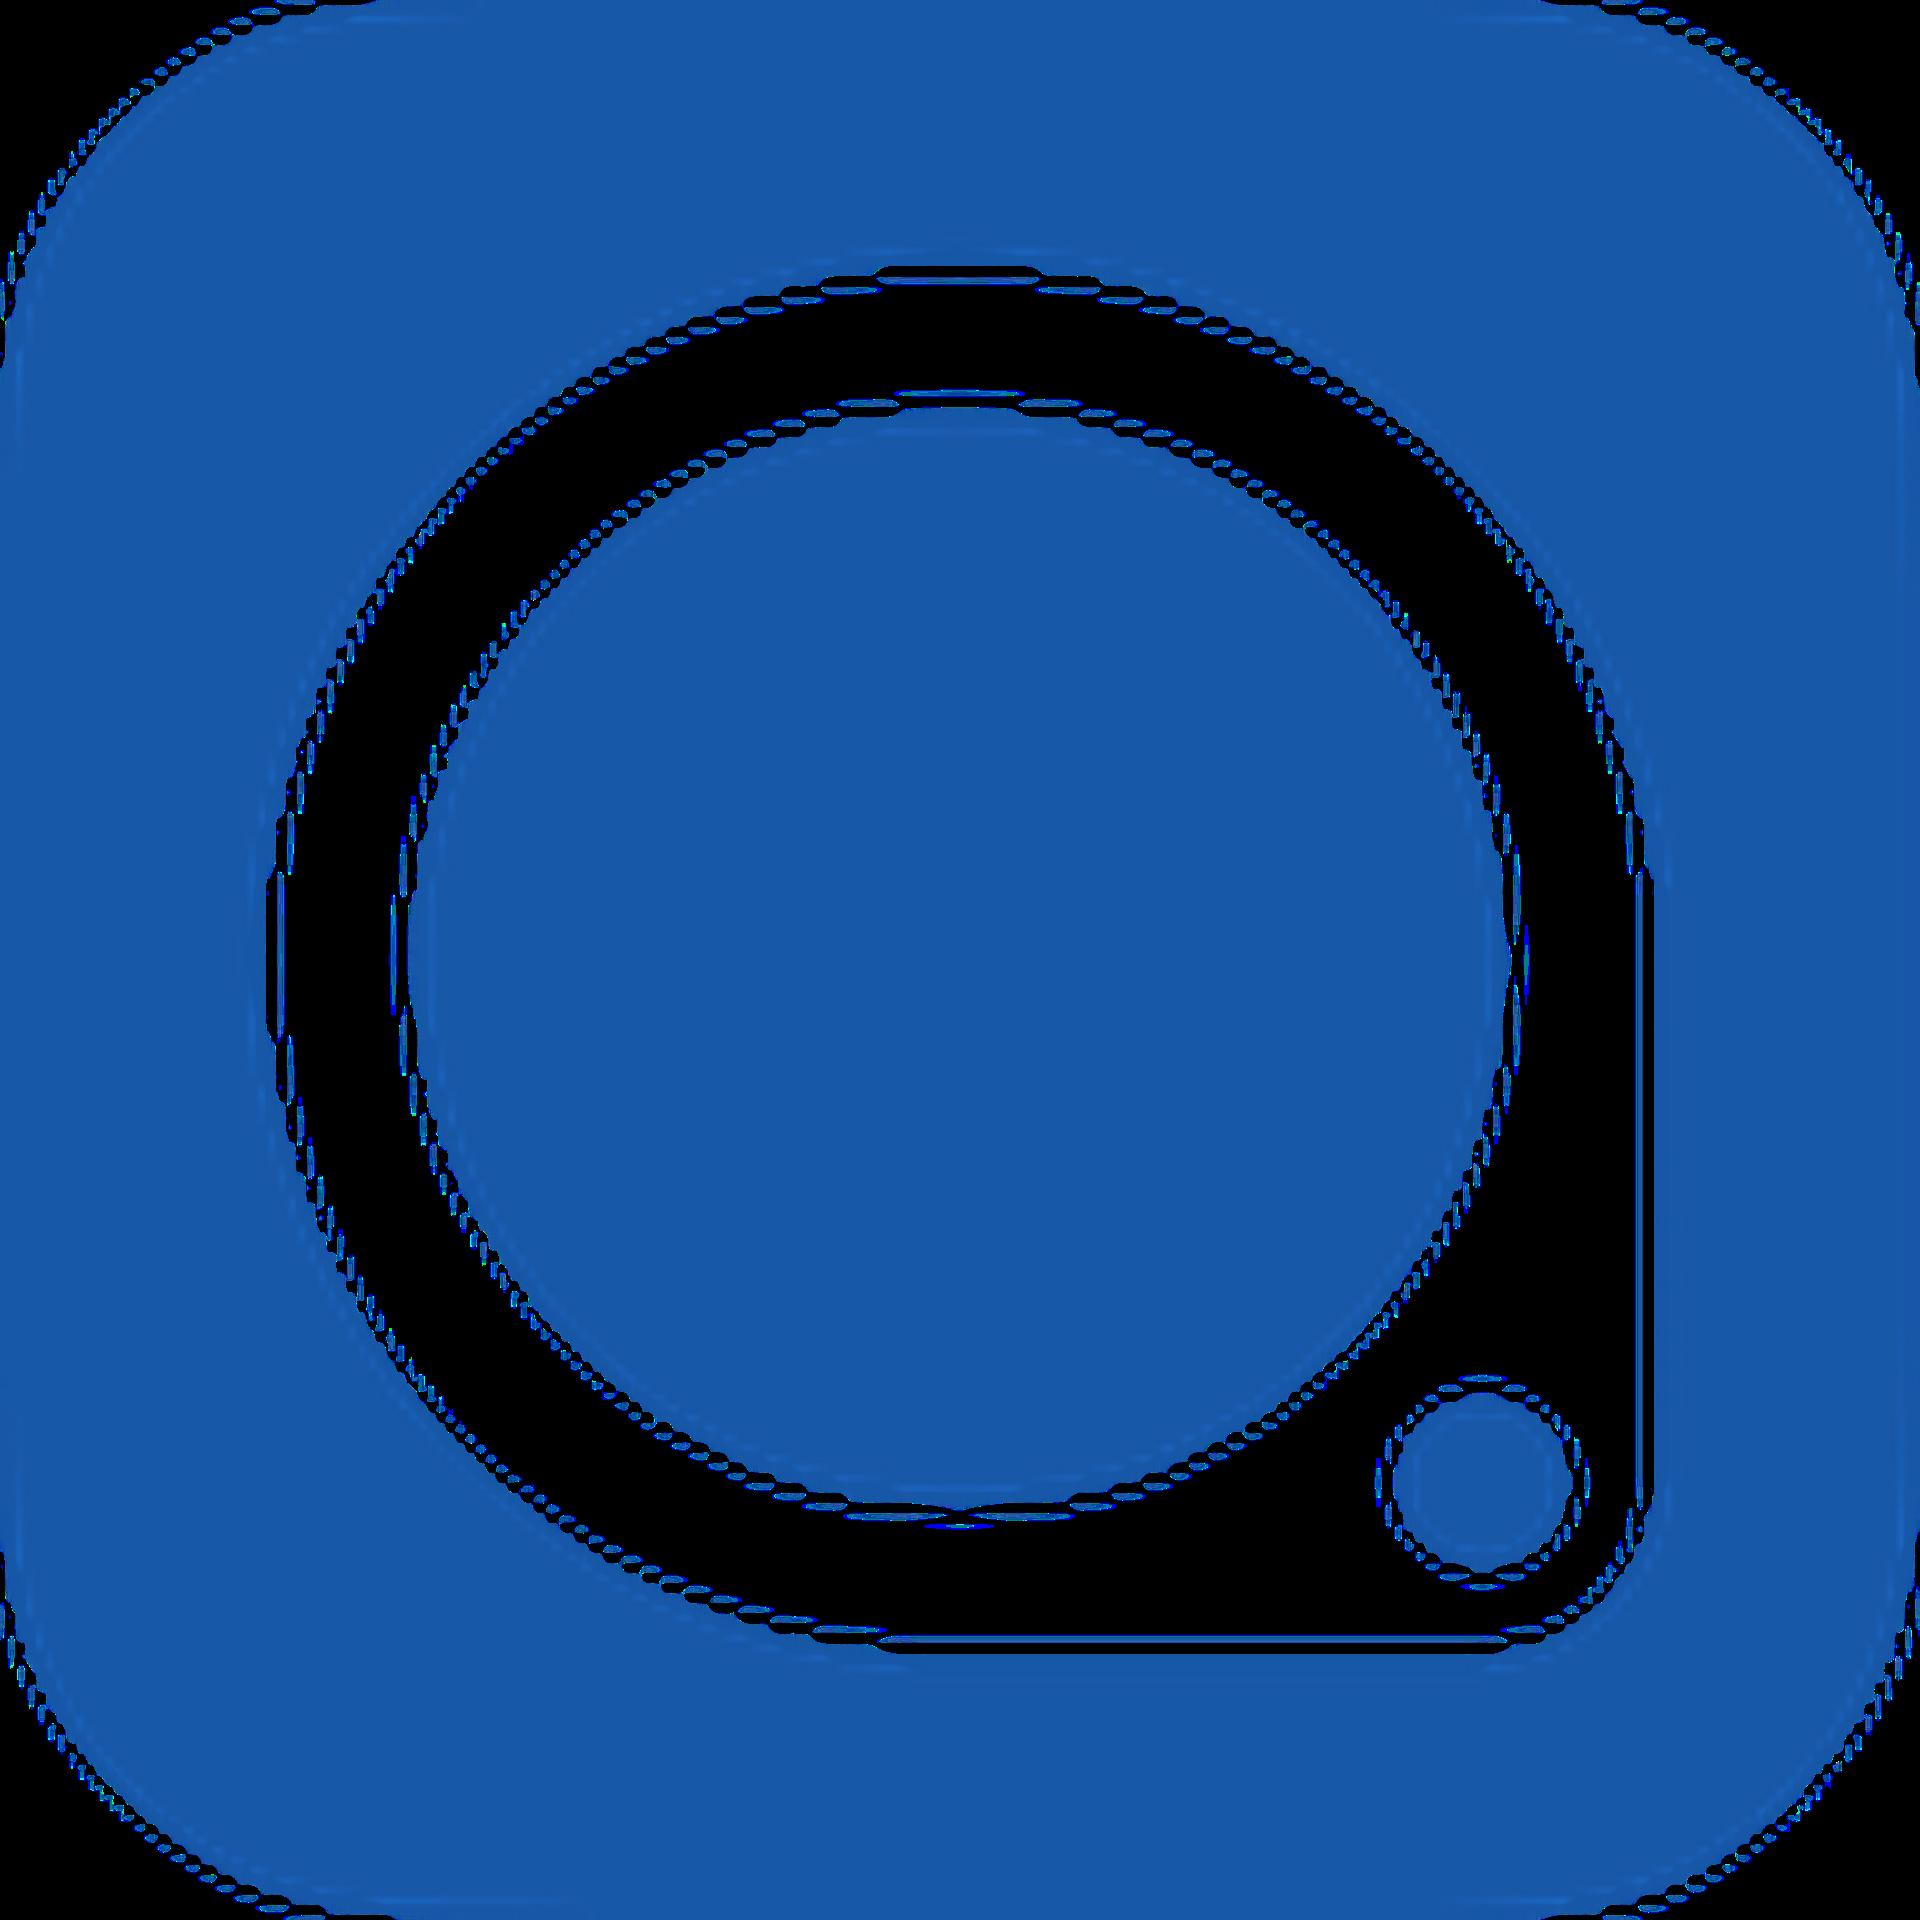 SVG Image